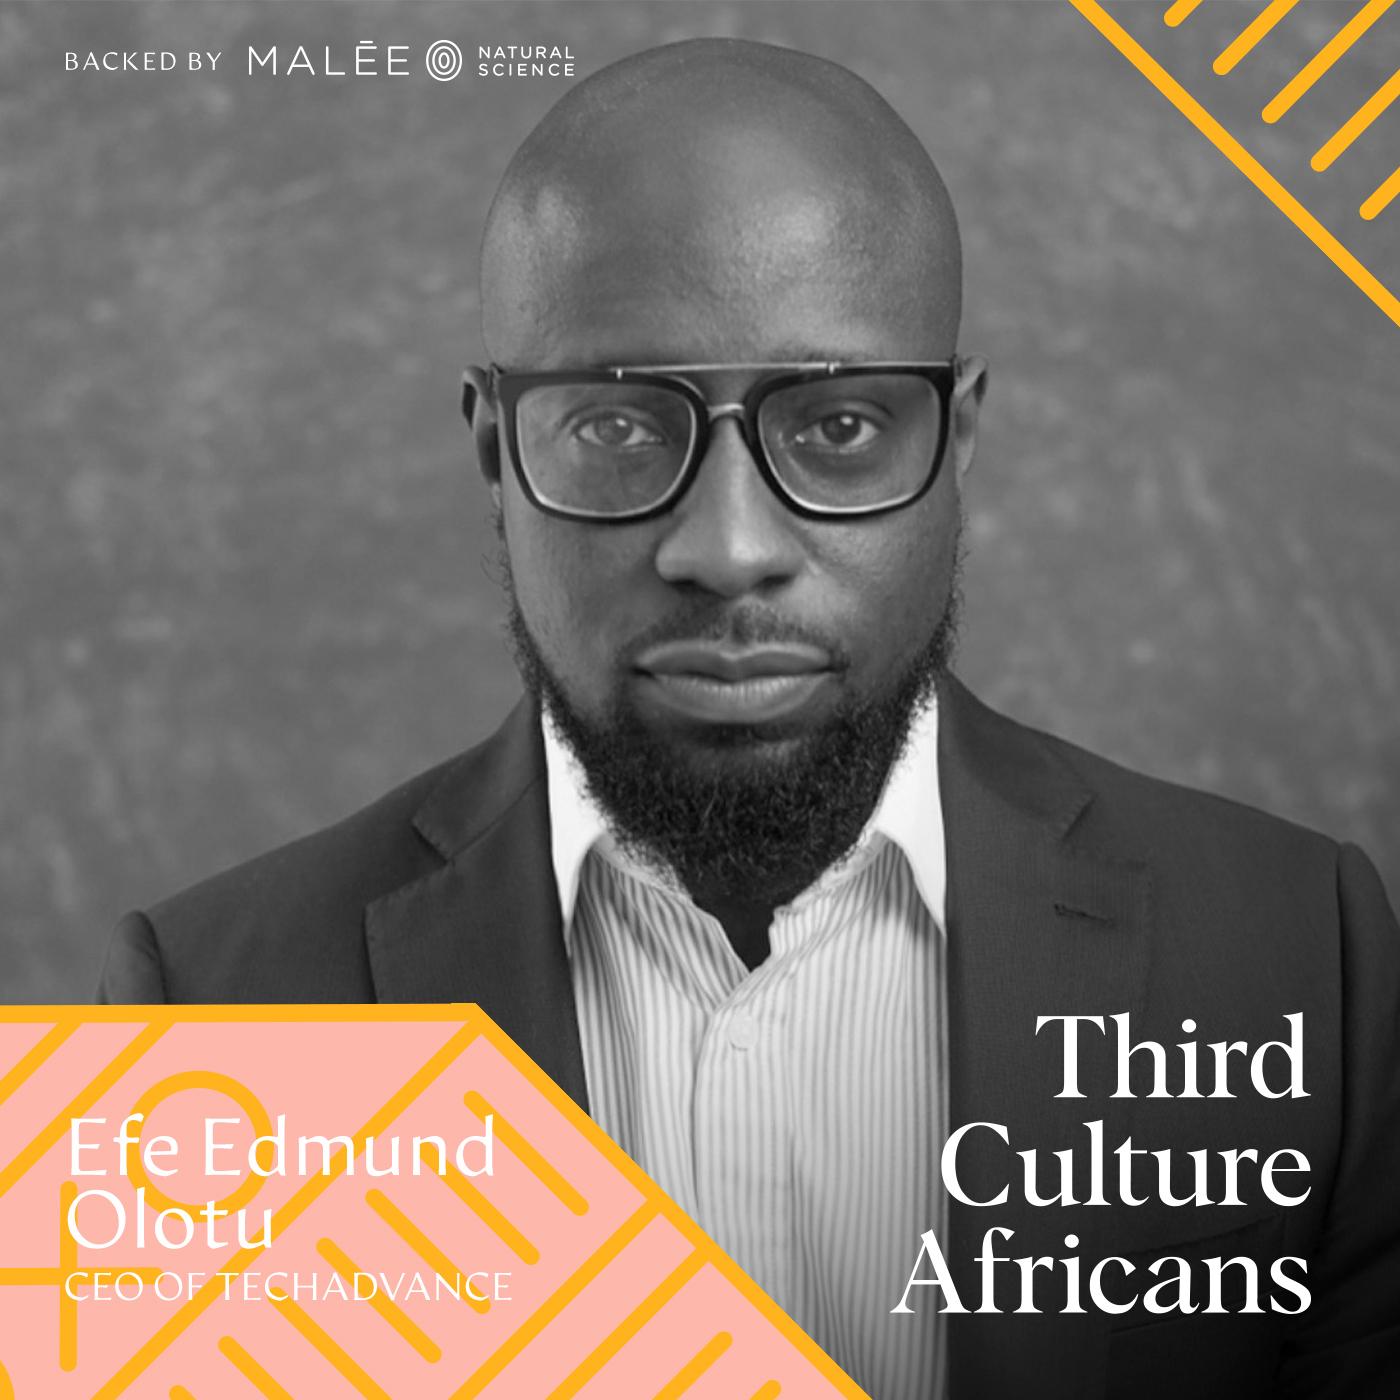 Third Culture Africans - EFE EDMUND OLOTU